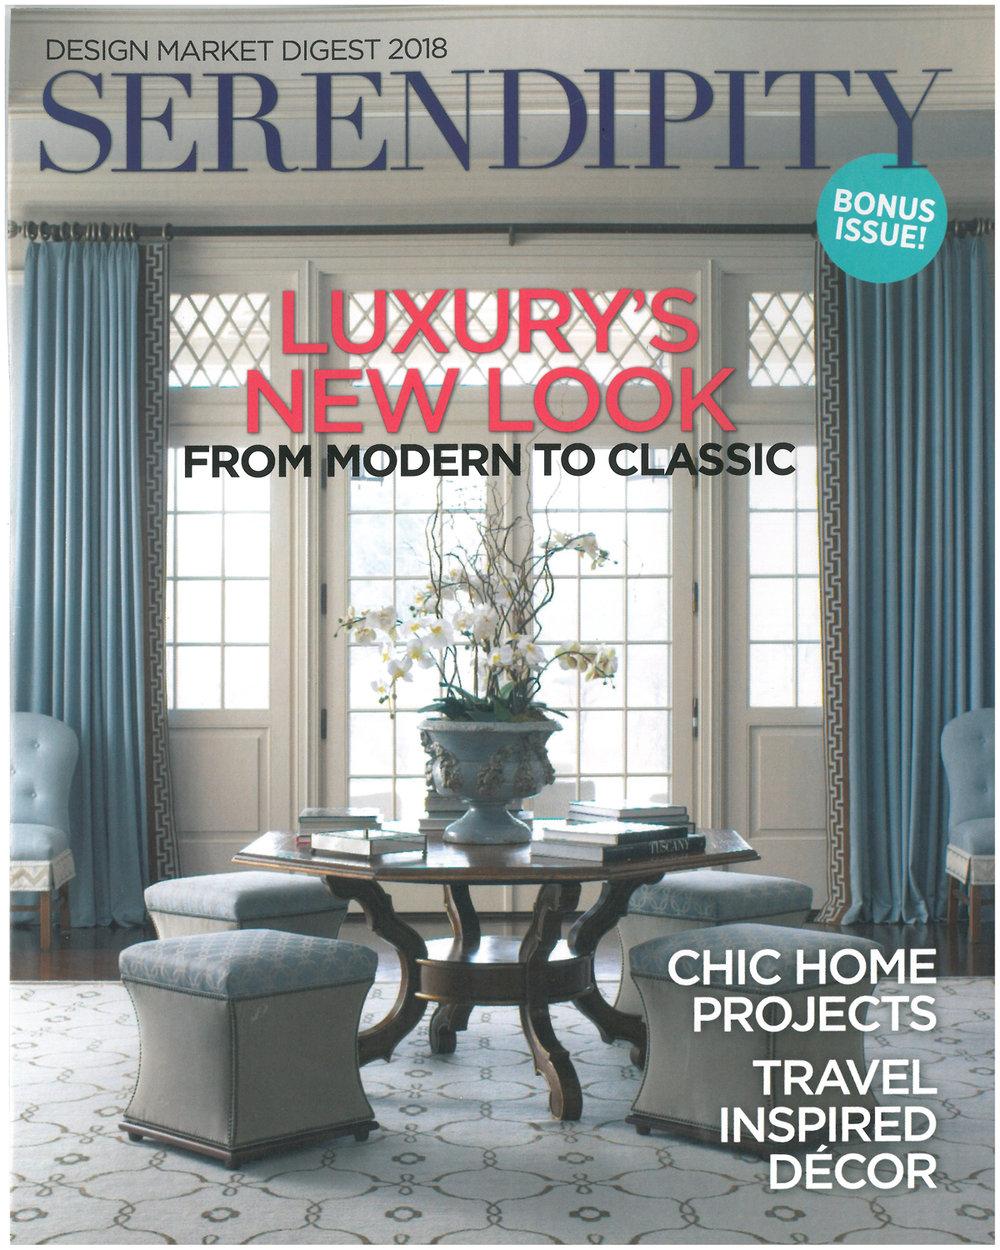 Serendipity Design Market Digest 2018